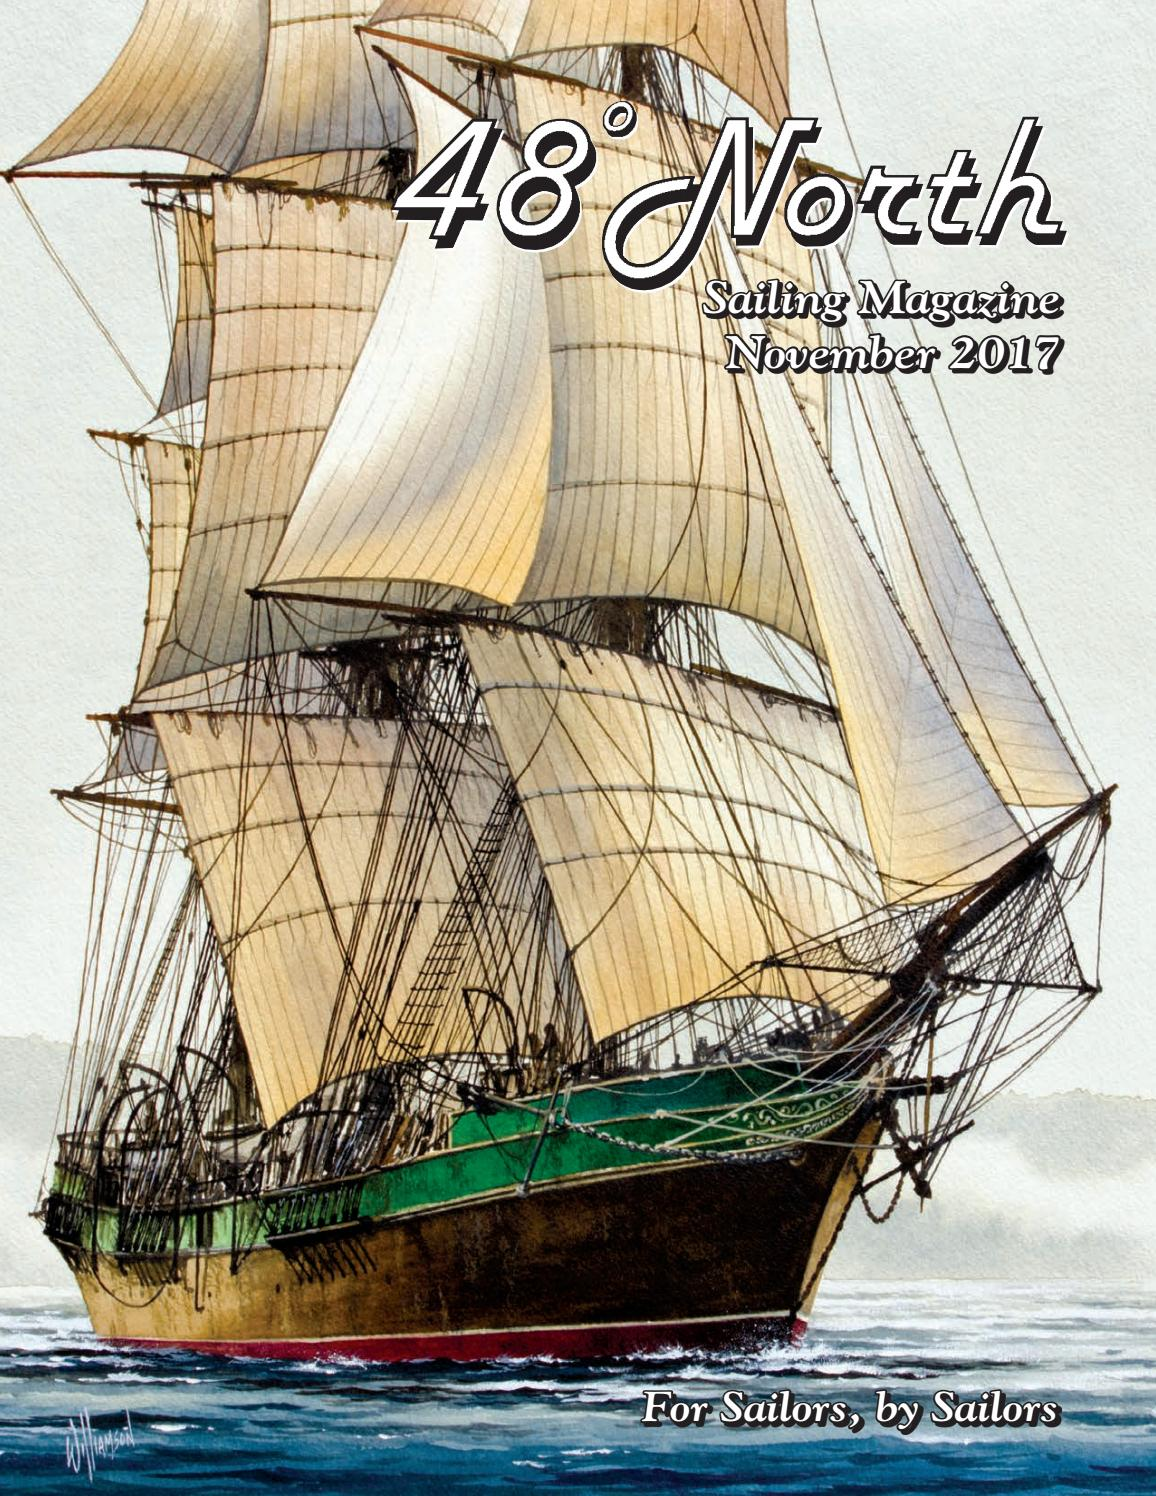 November 2017 48 North by 48° North - issuu